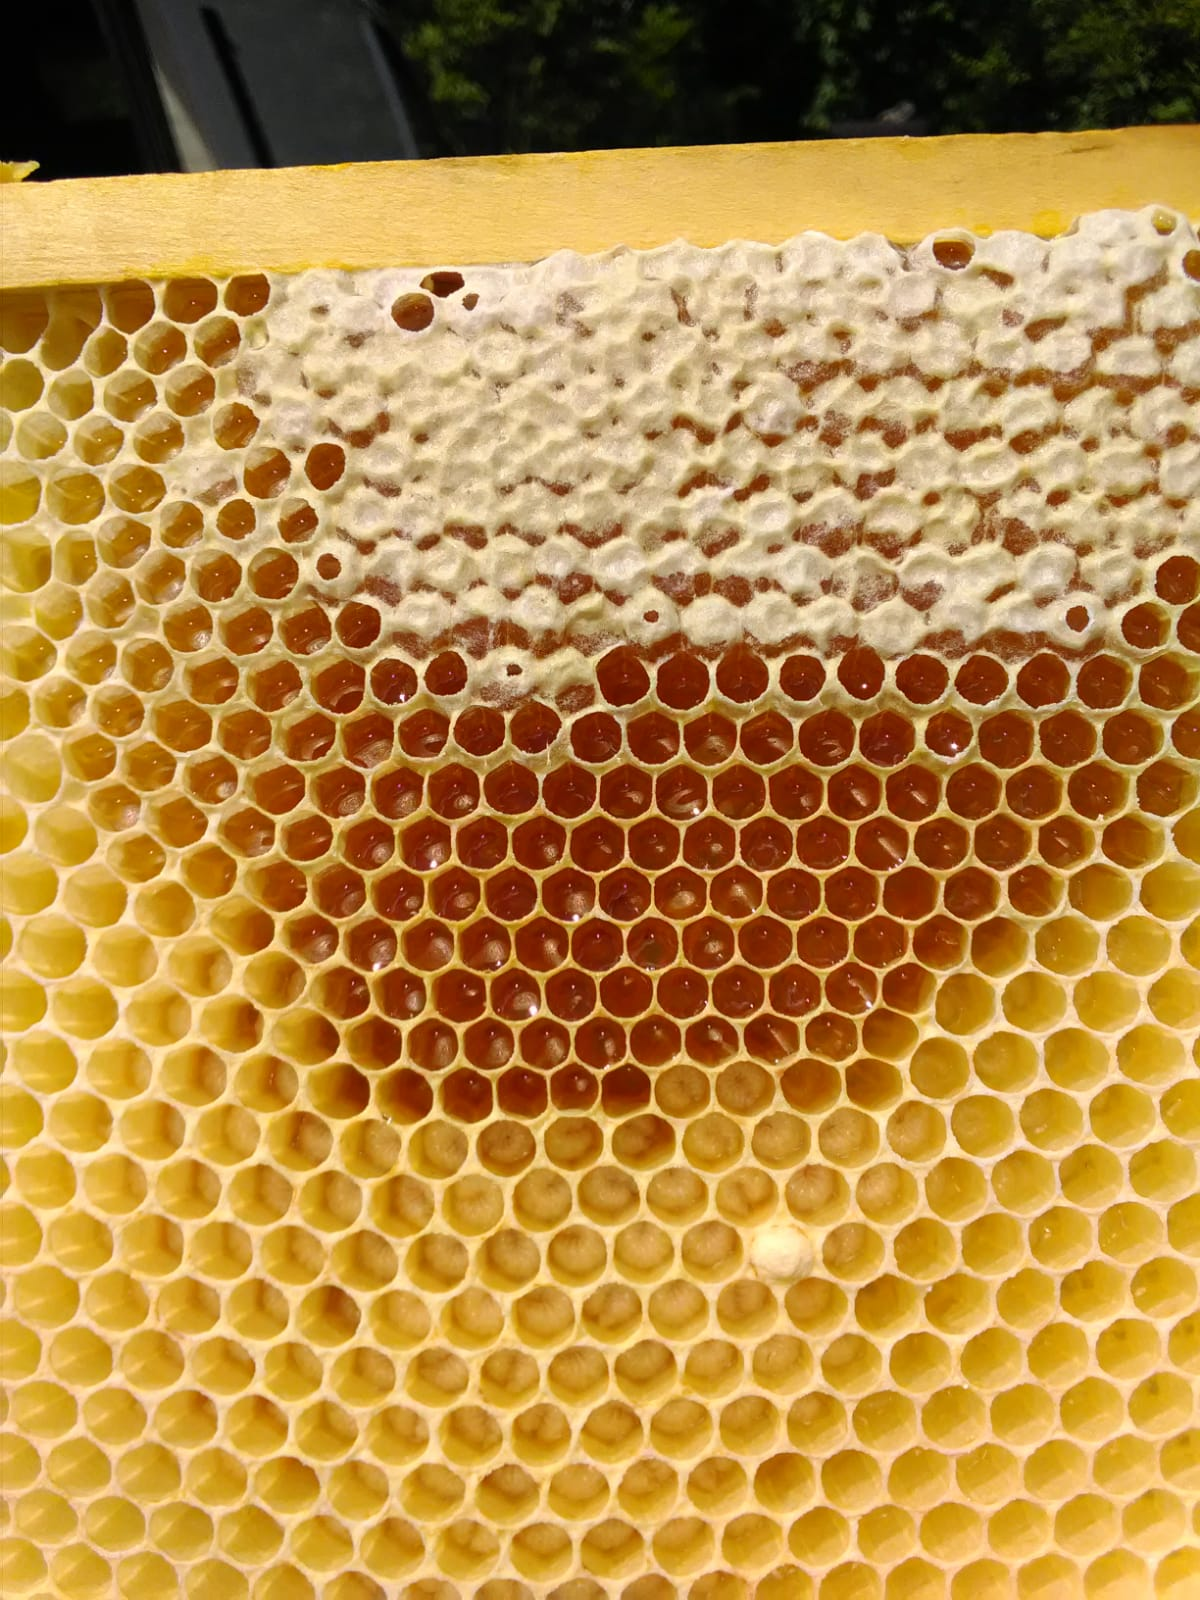 Bio Imkerei Foidl - Honig Bienenhonig Honigprodukte Kitzbühel Kirchberg